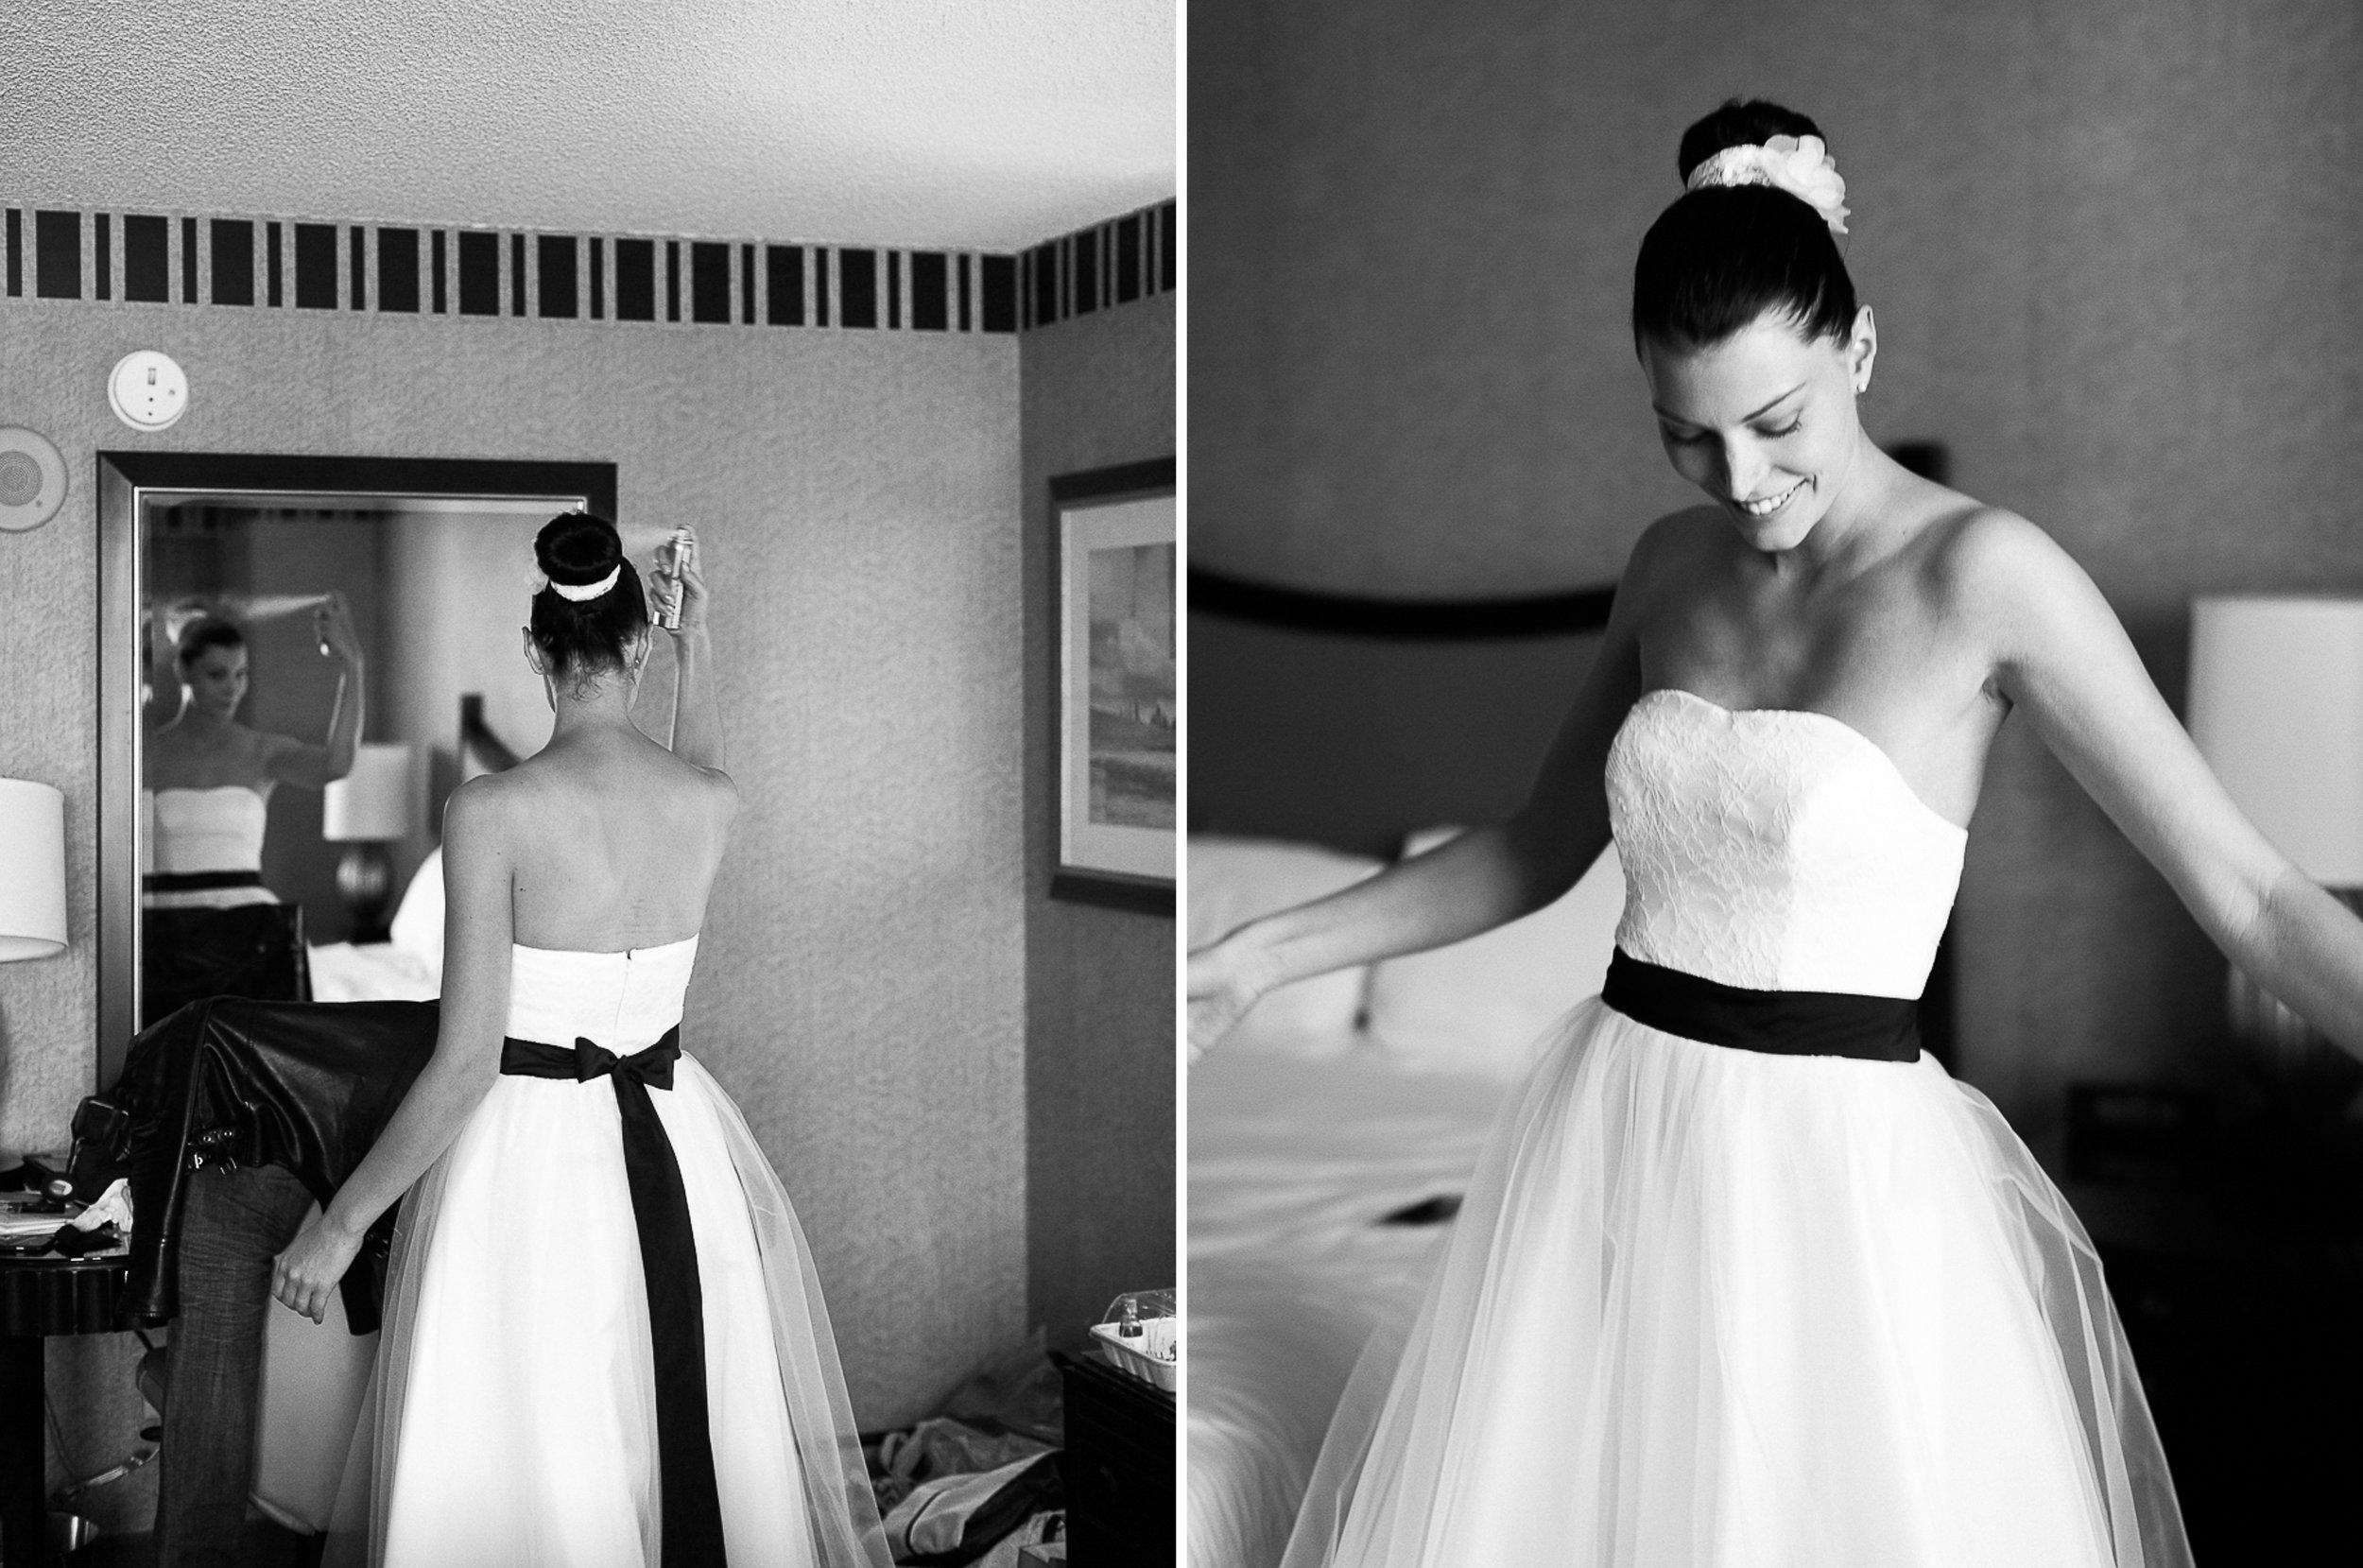 Susi-und-Danu-Hochzeit-Theresa-Pewal-Fotografie-fine-art-3.jpg